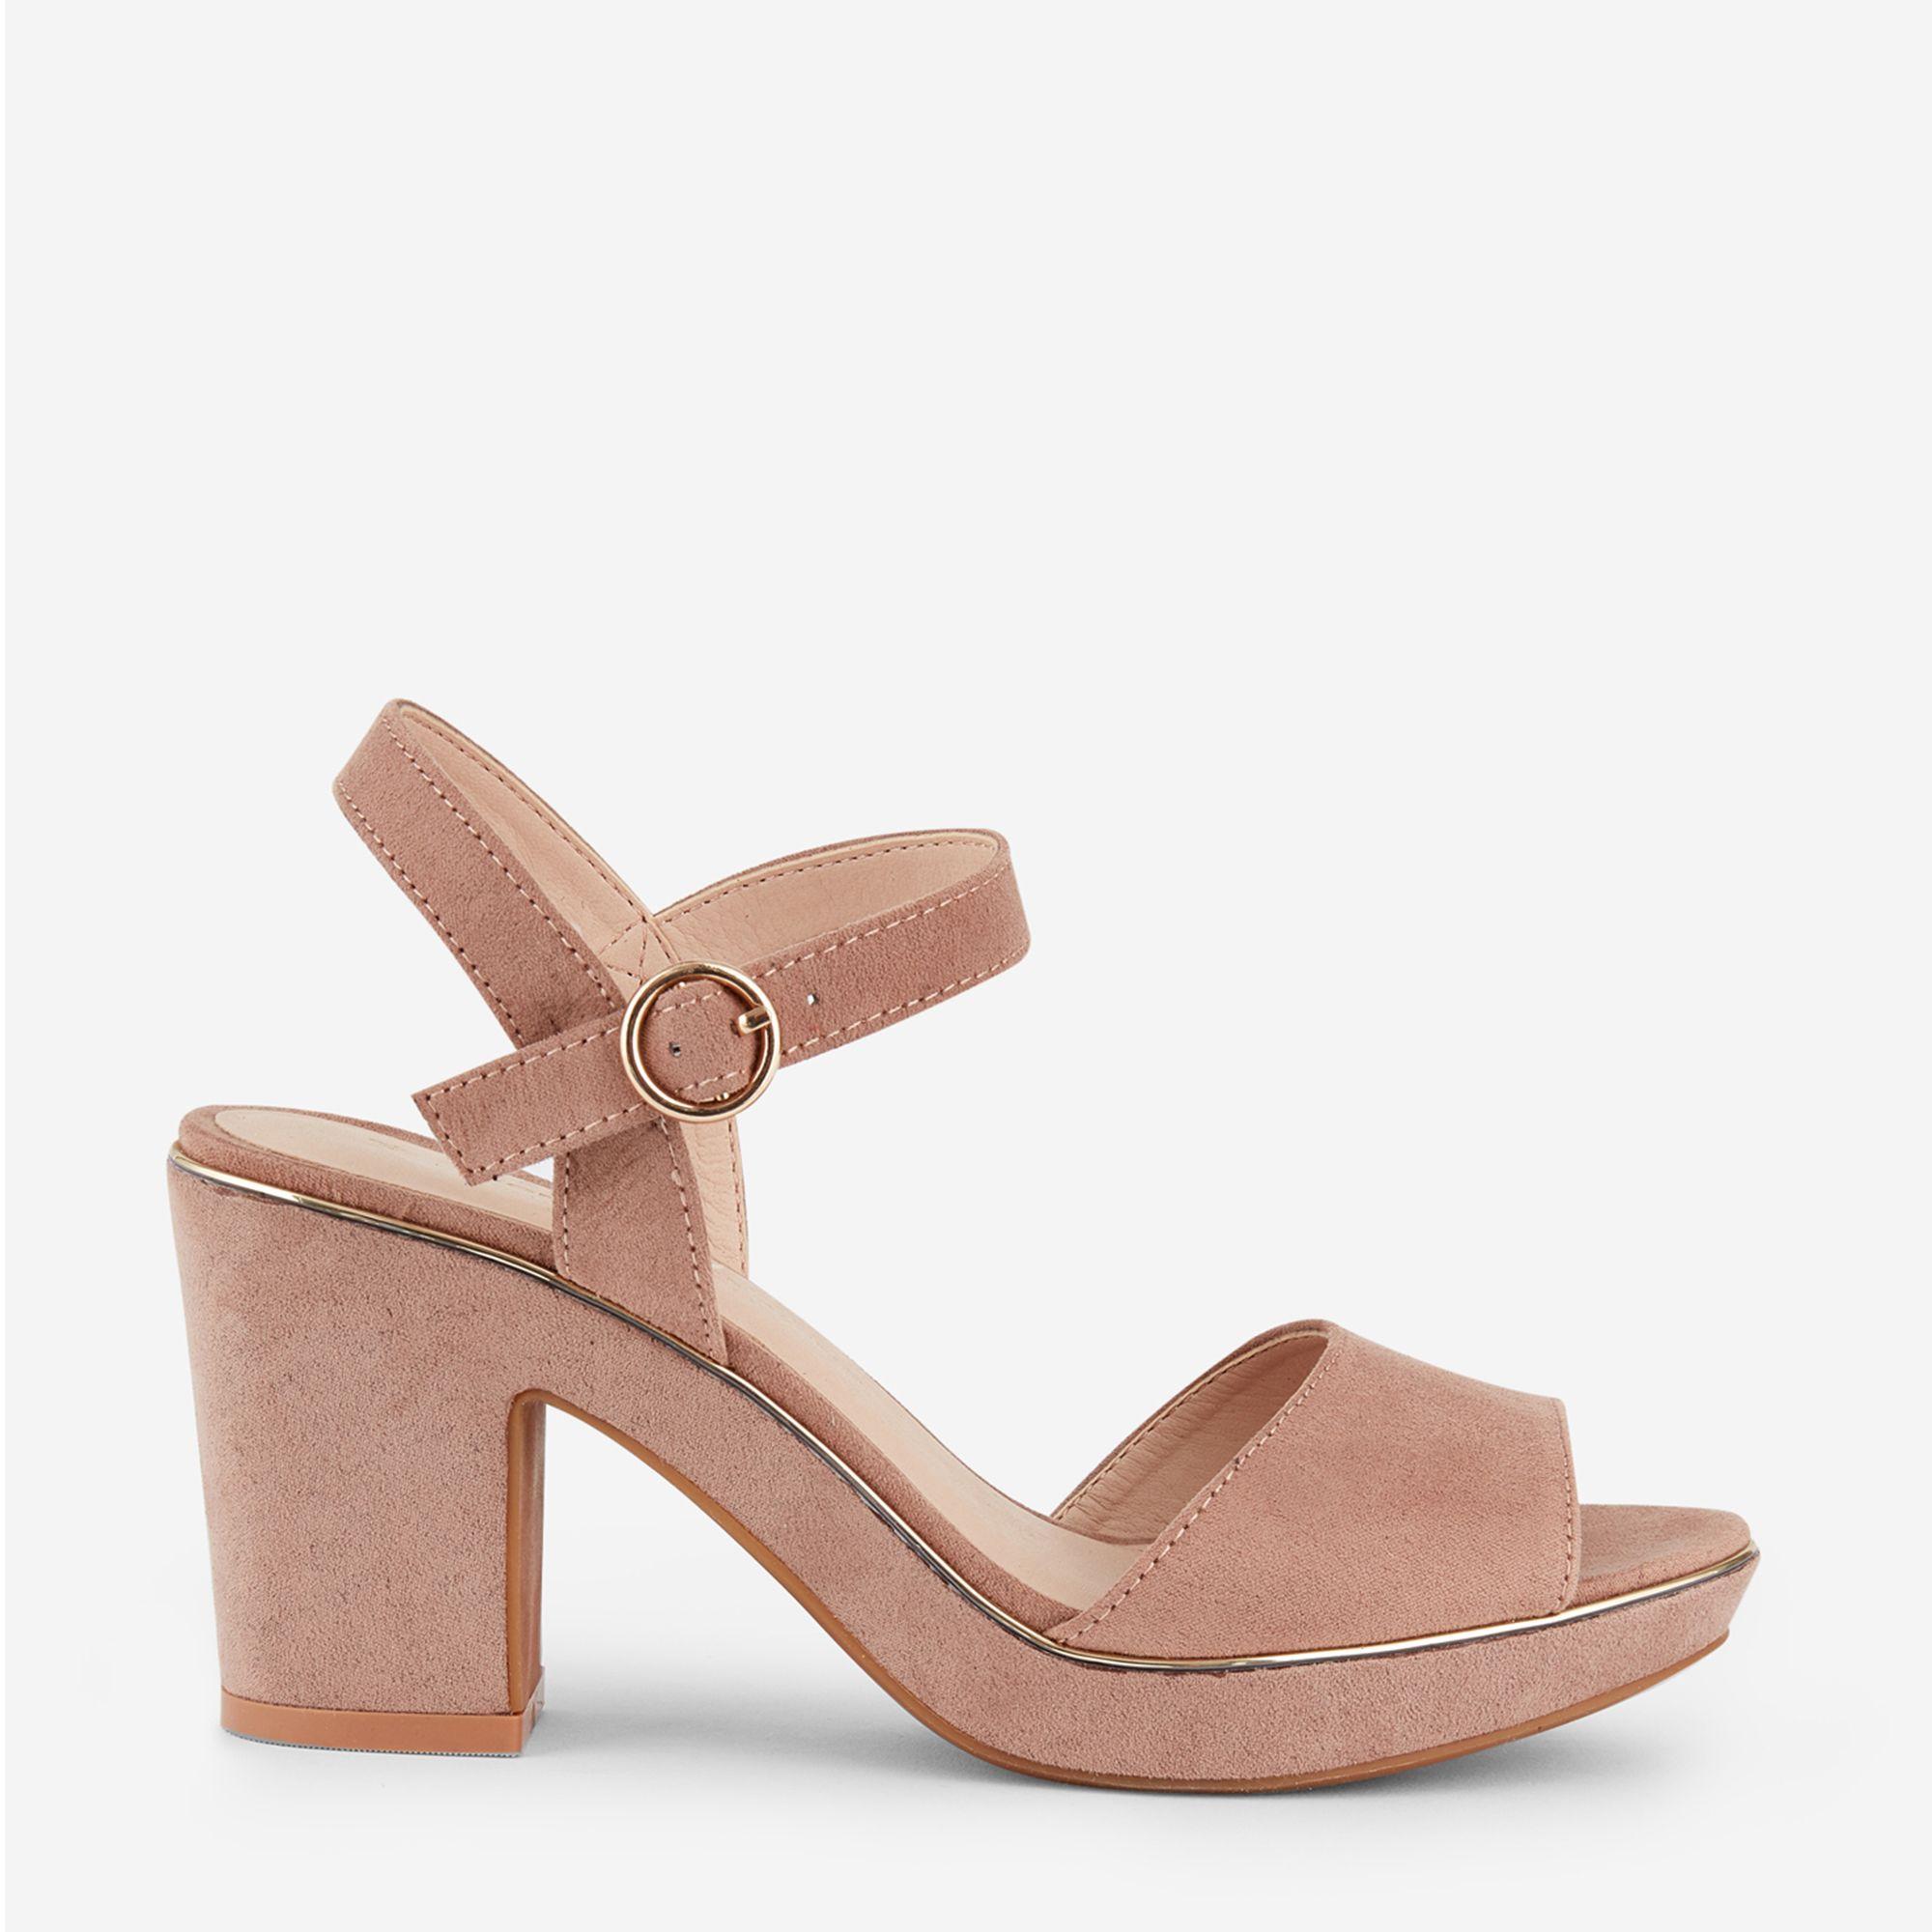 Dorothy Perkins Lyst Strap Sandals Stormy Multi Cream Mules mn0N8w